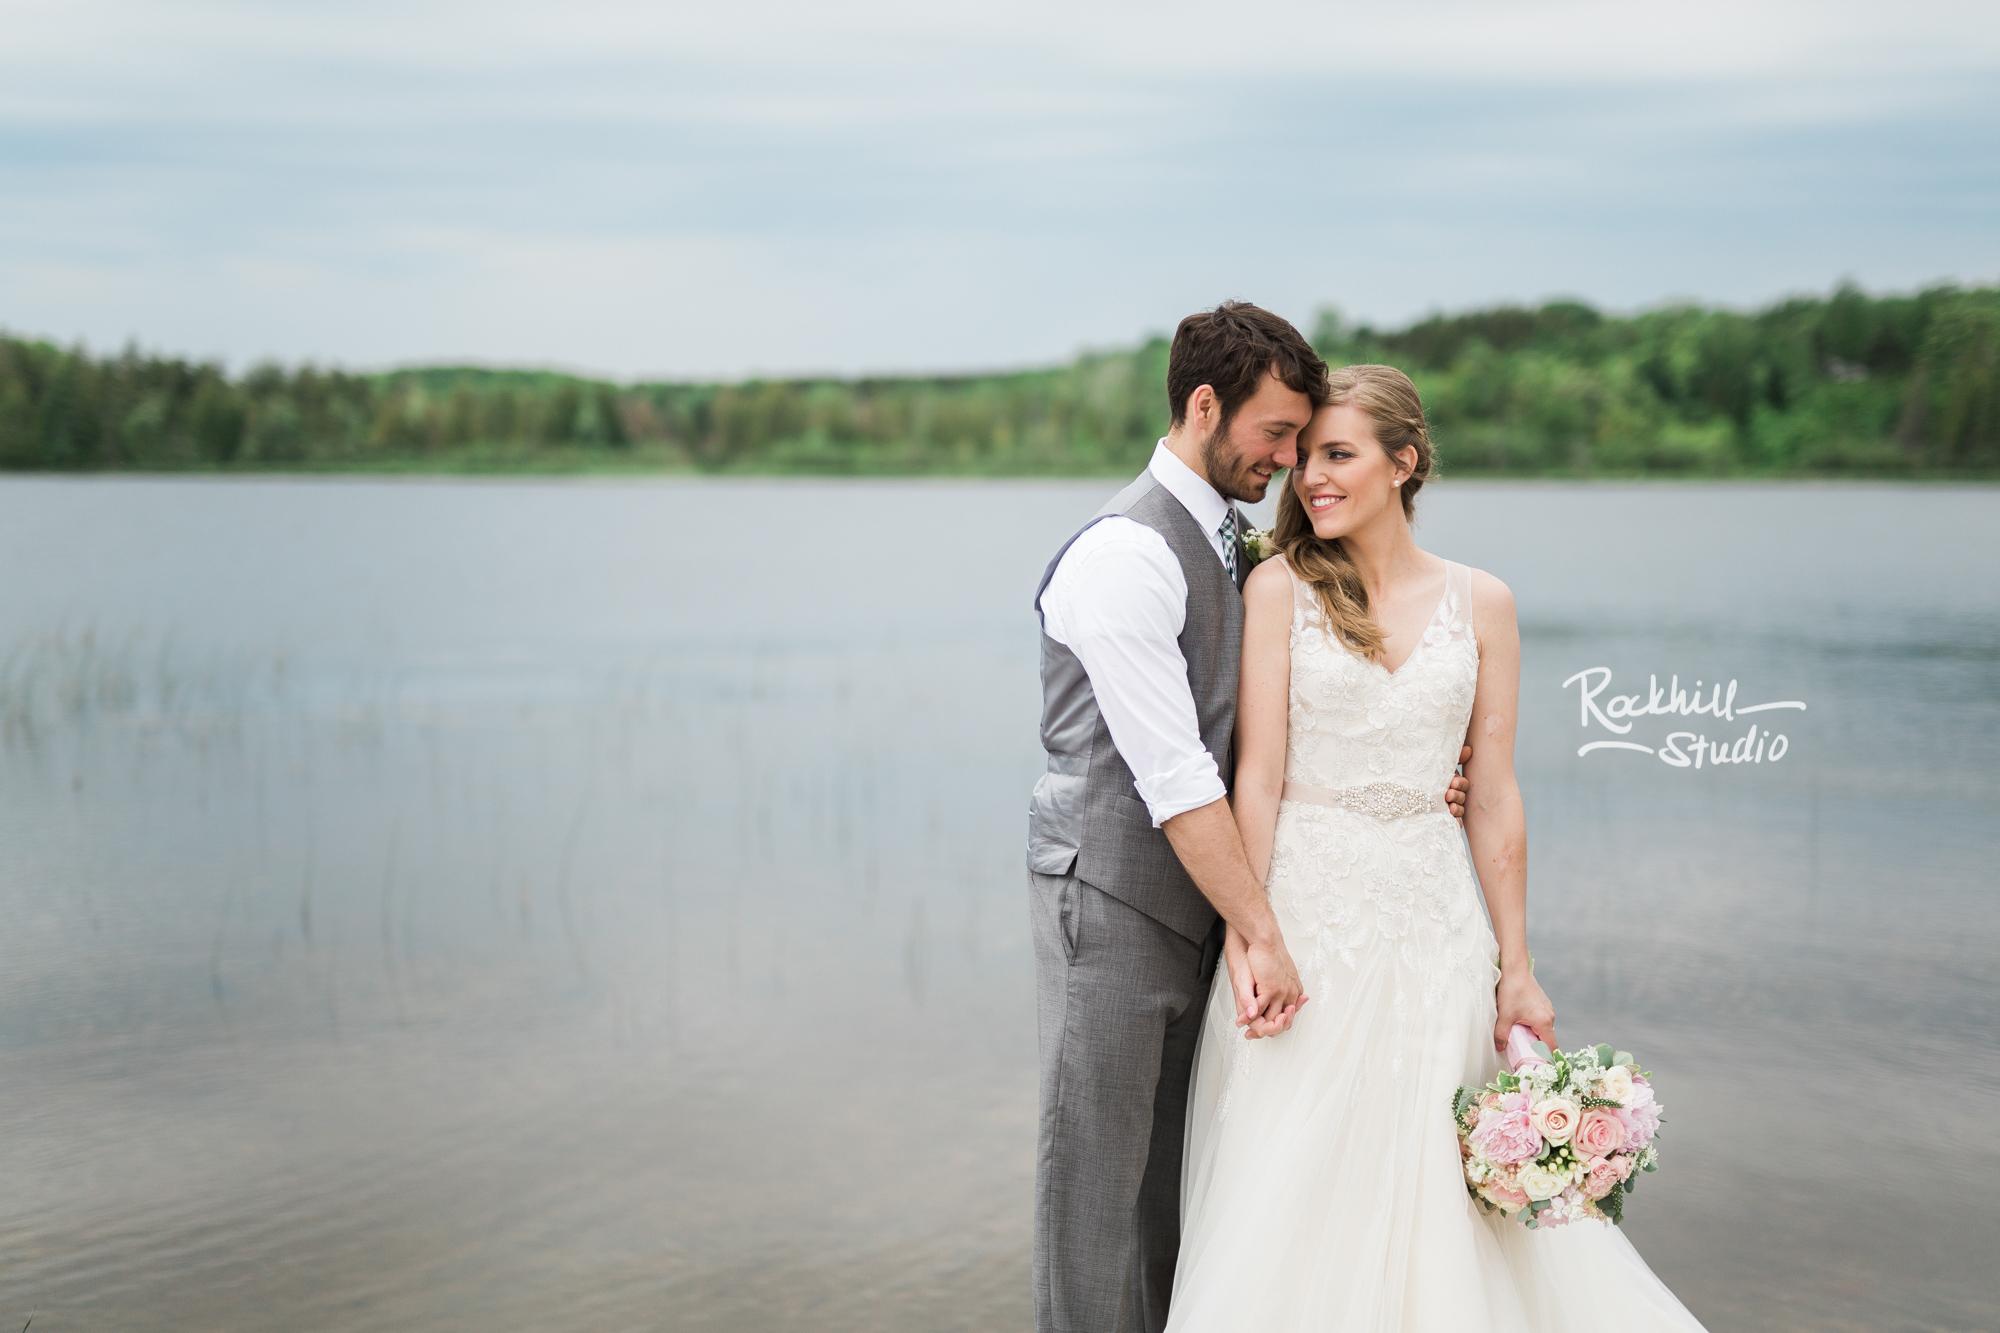 marquette-michigan-wedding-upper-peninsula-spring-photography-rockhill-ee-45.jpg